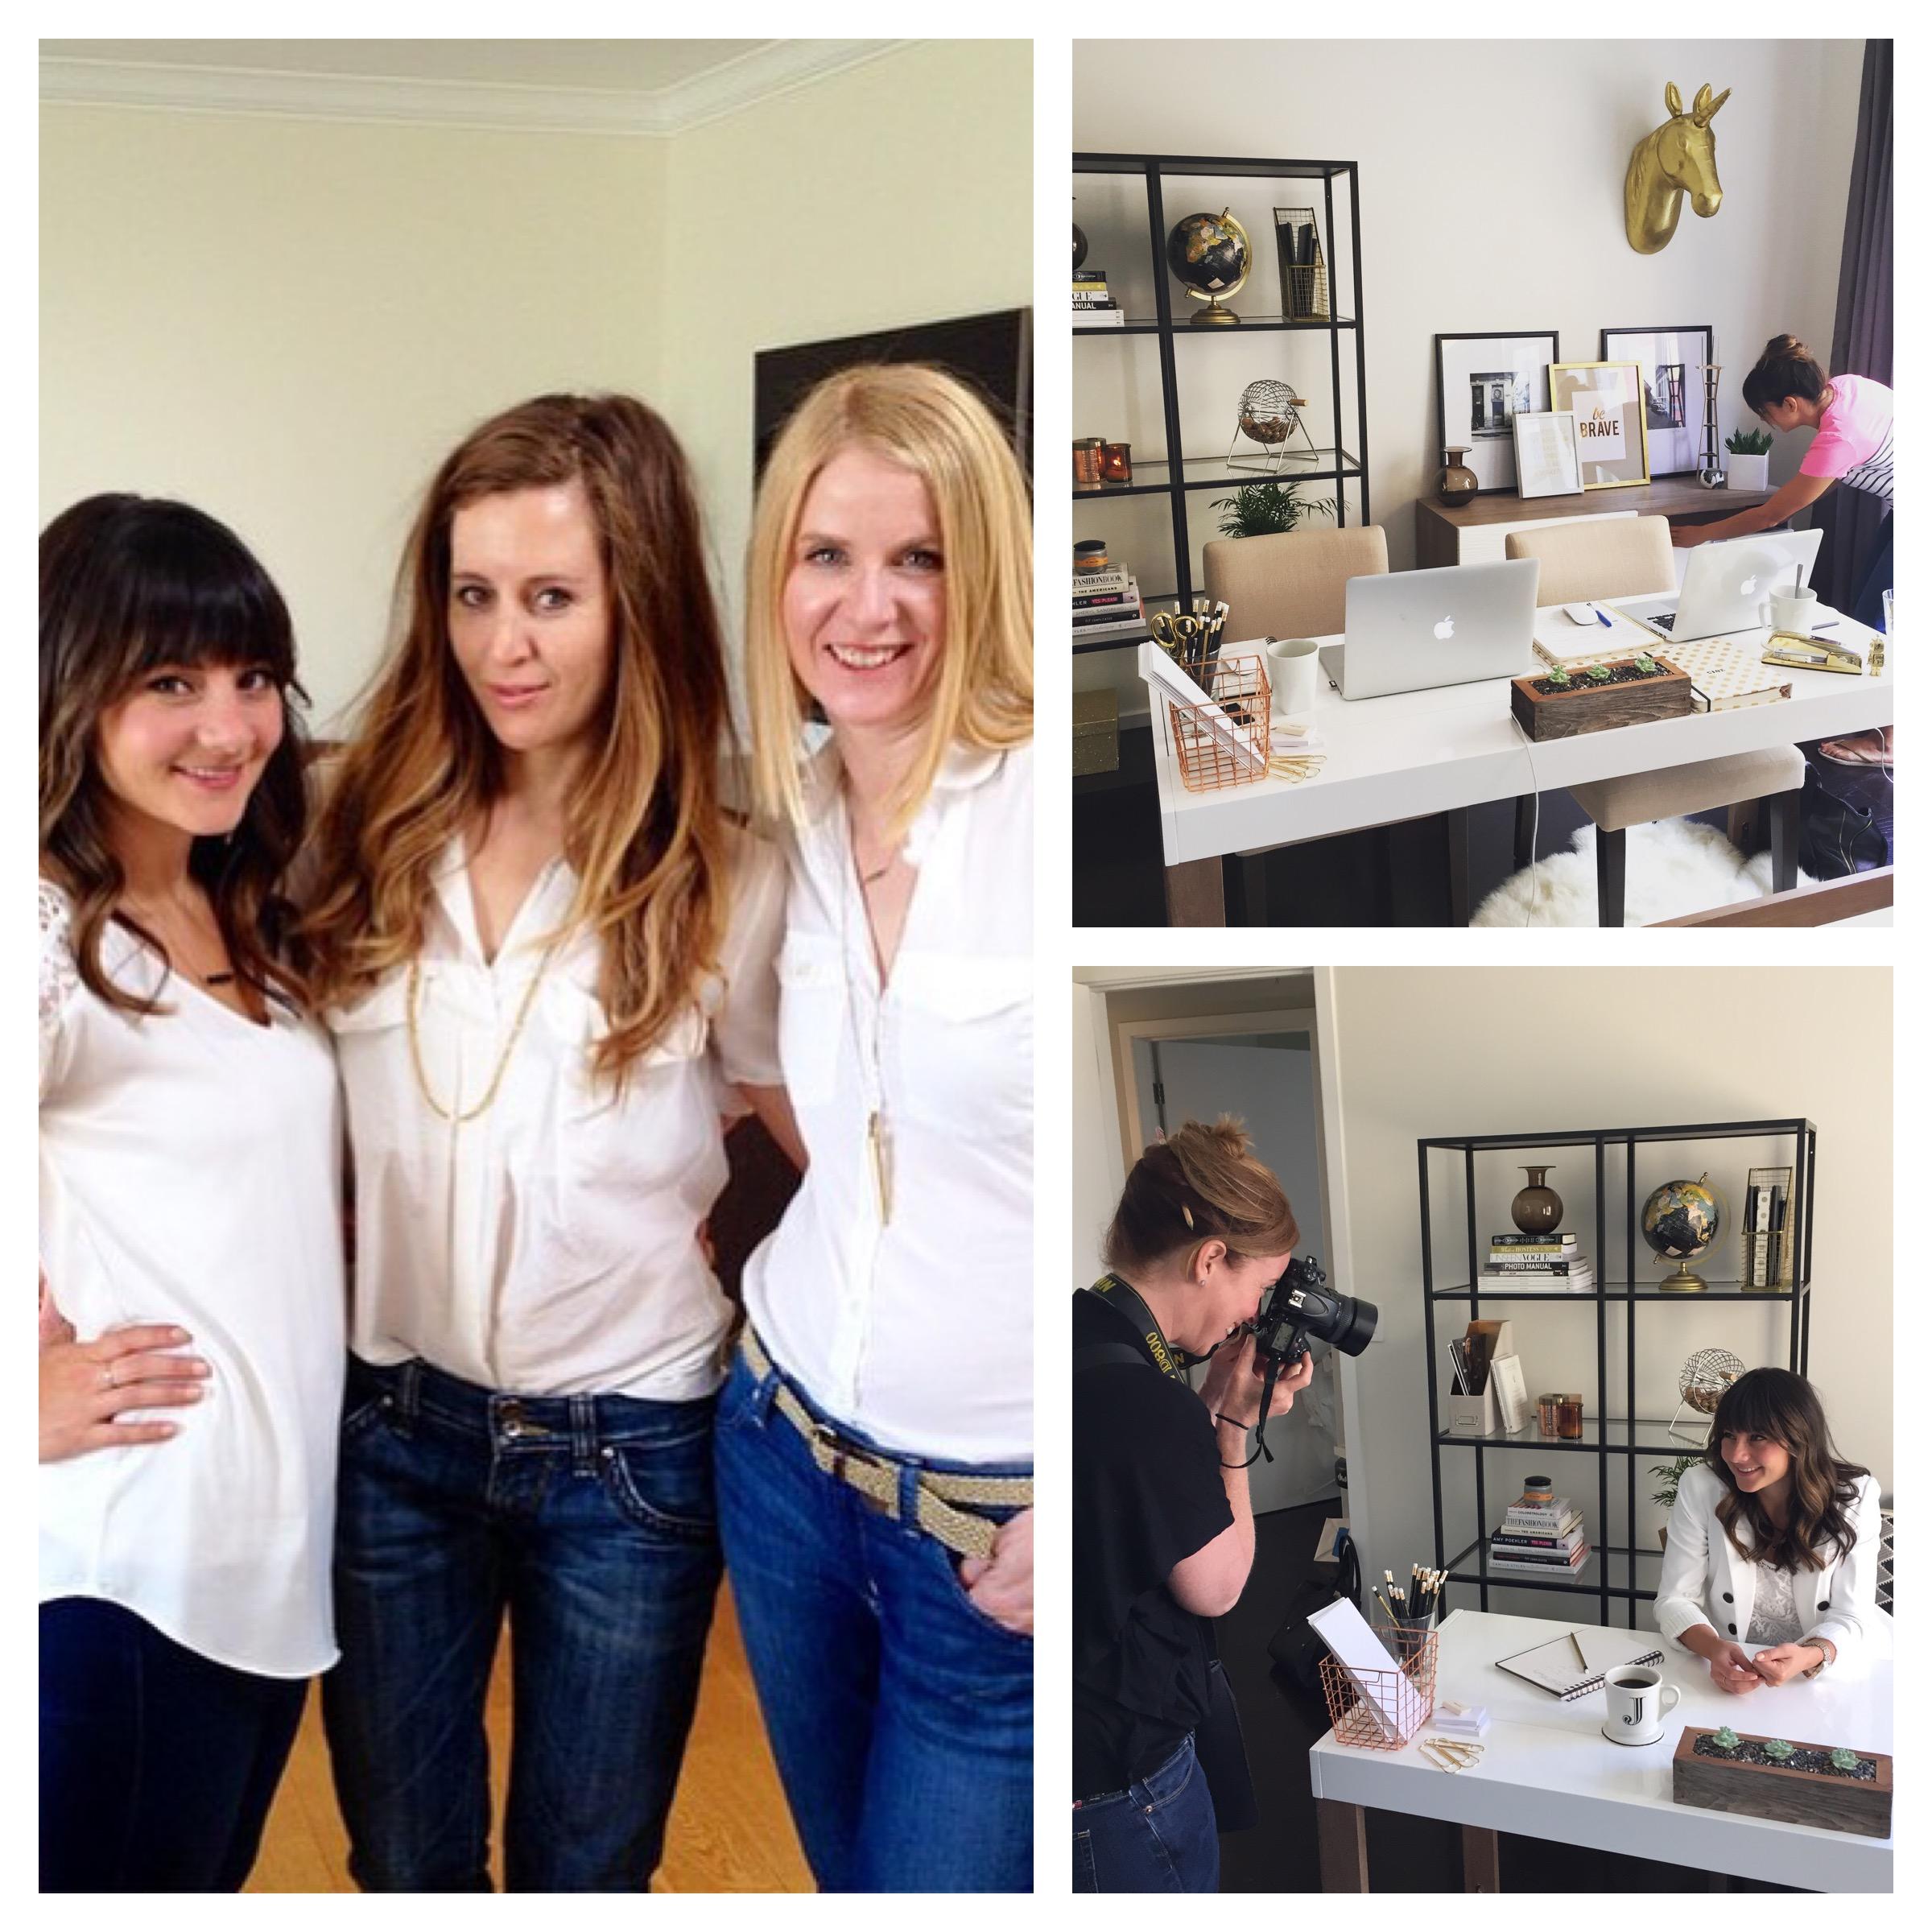 Behind the scenes at Prim'd Marketing website shoot with Nikola Elaine & Kristen Loken